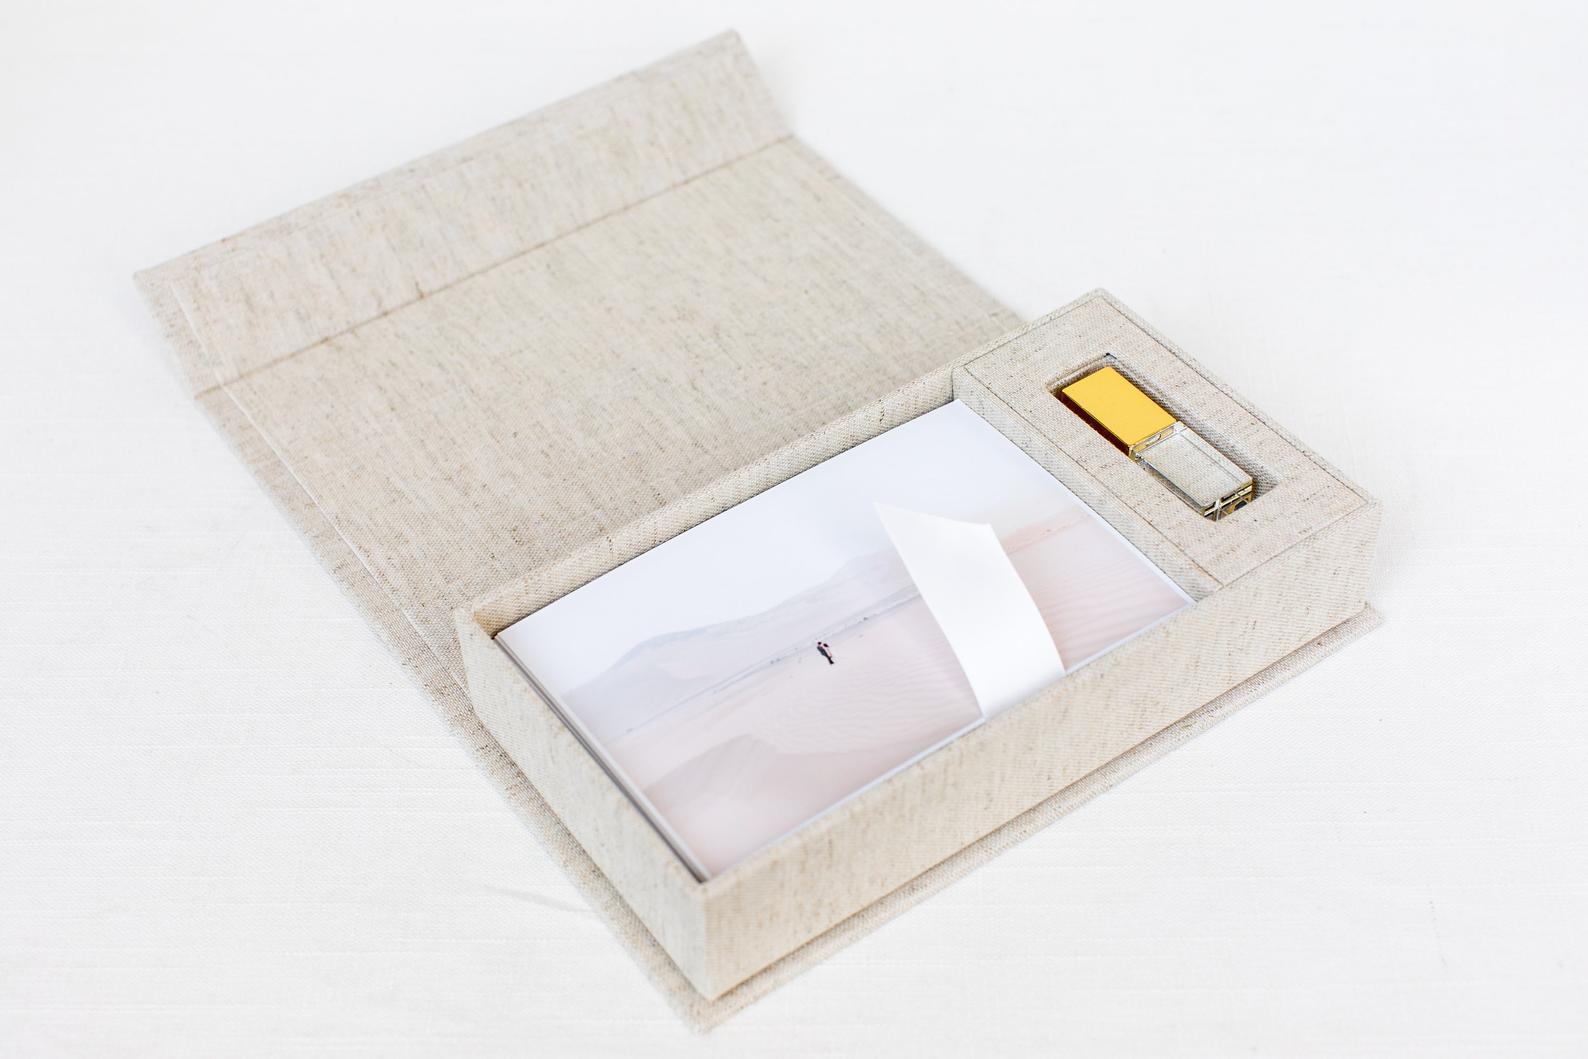 USB drive + presentation box with prints